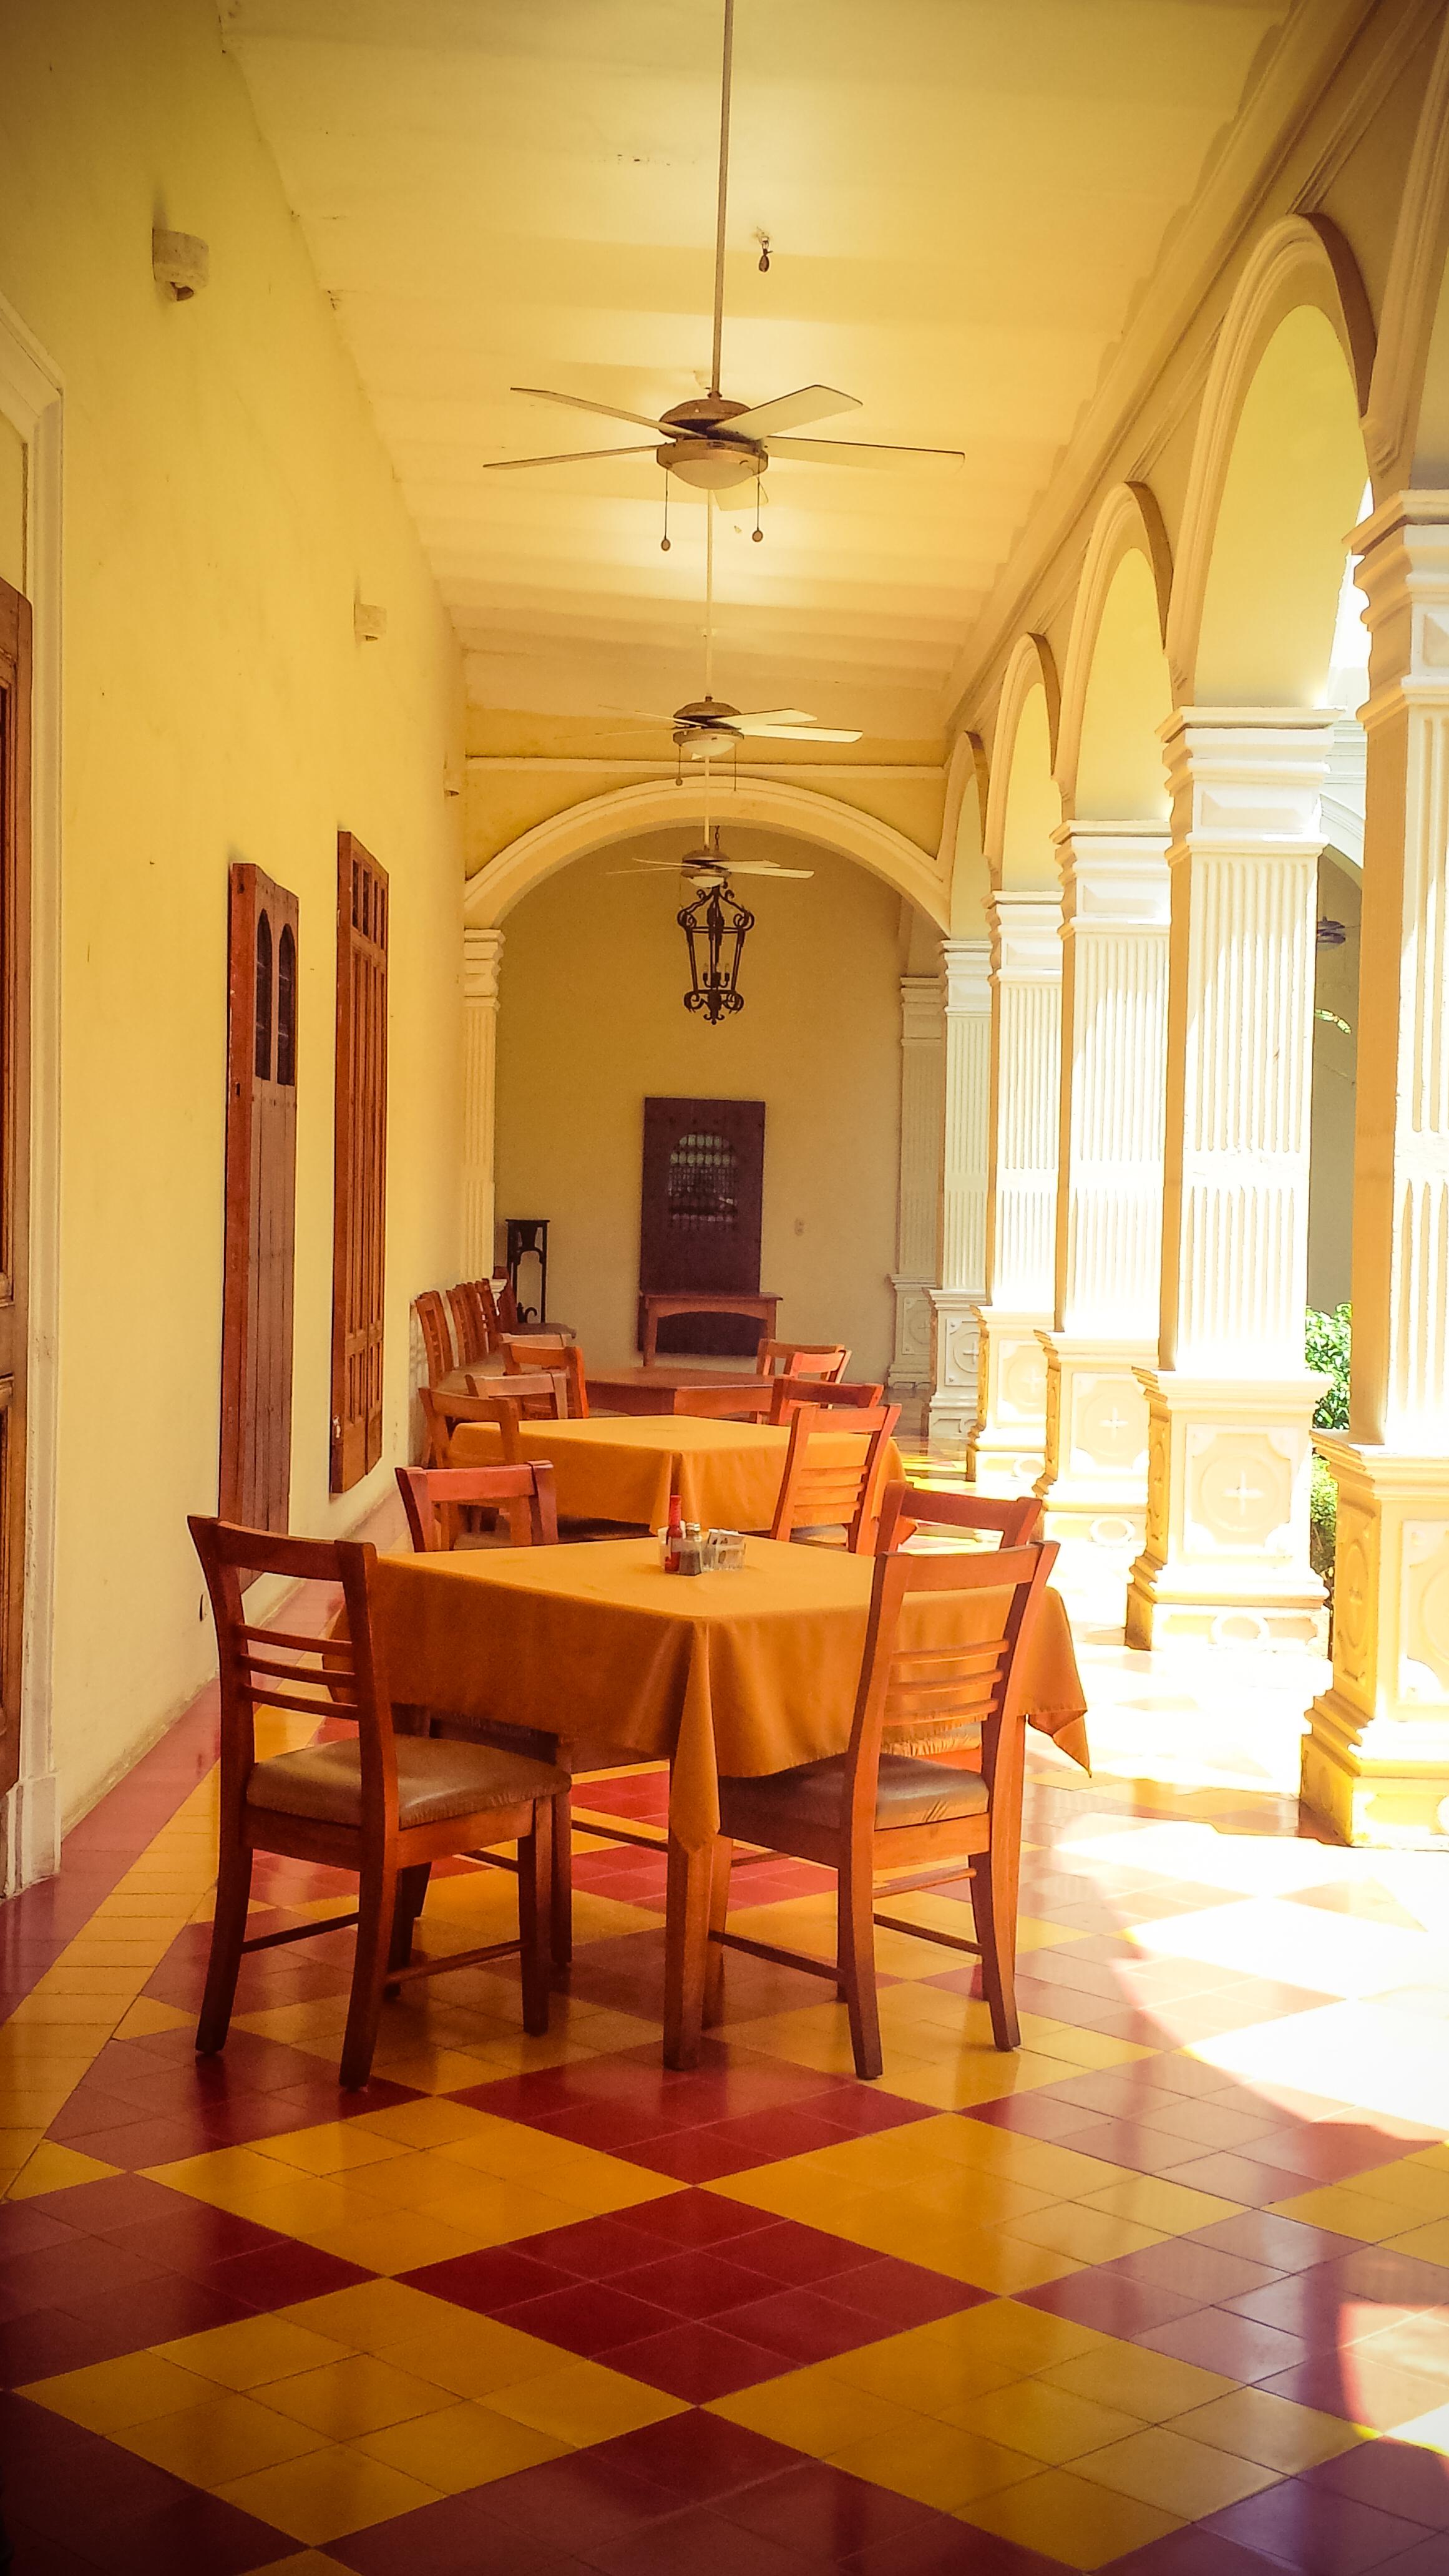 Inside Hotel La Perla